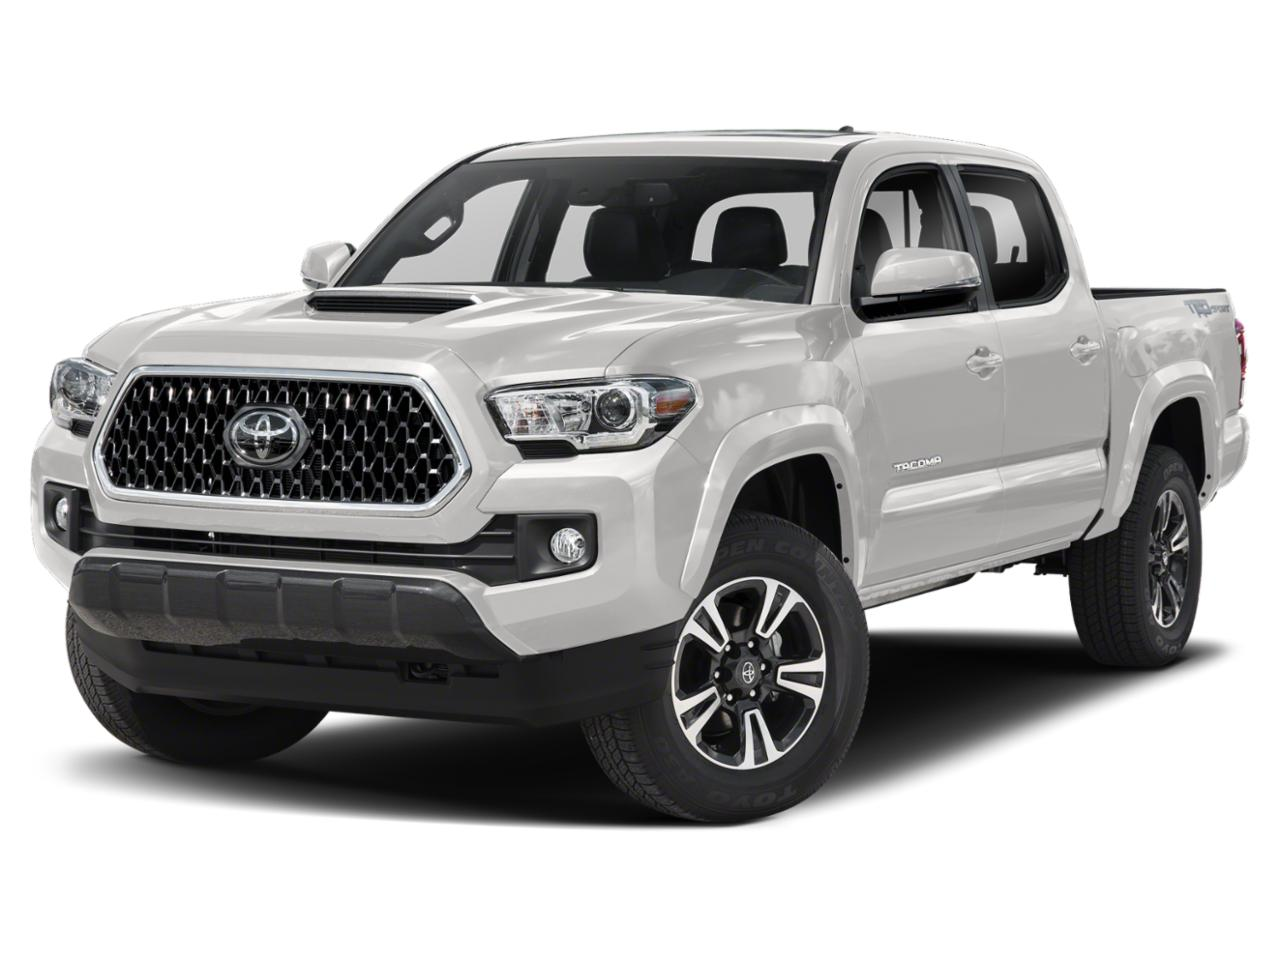 2019 Toyota Tacoma 2WD Vehicle Photo in Harvey, LA 70058